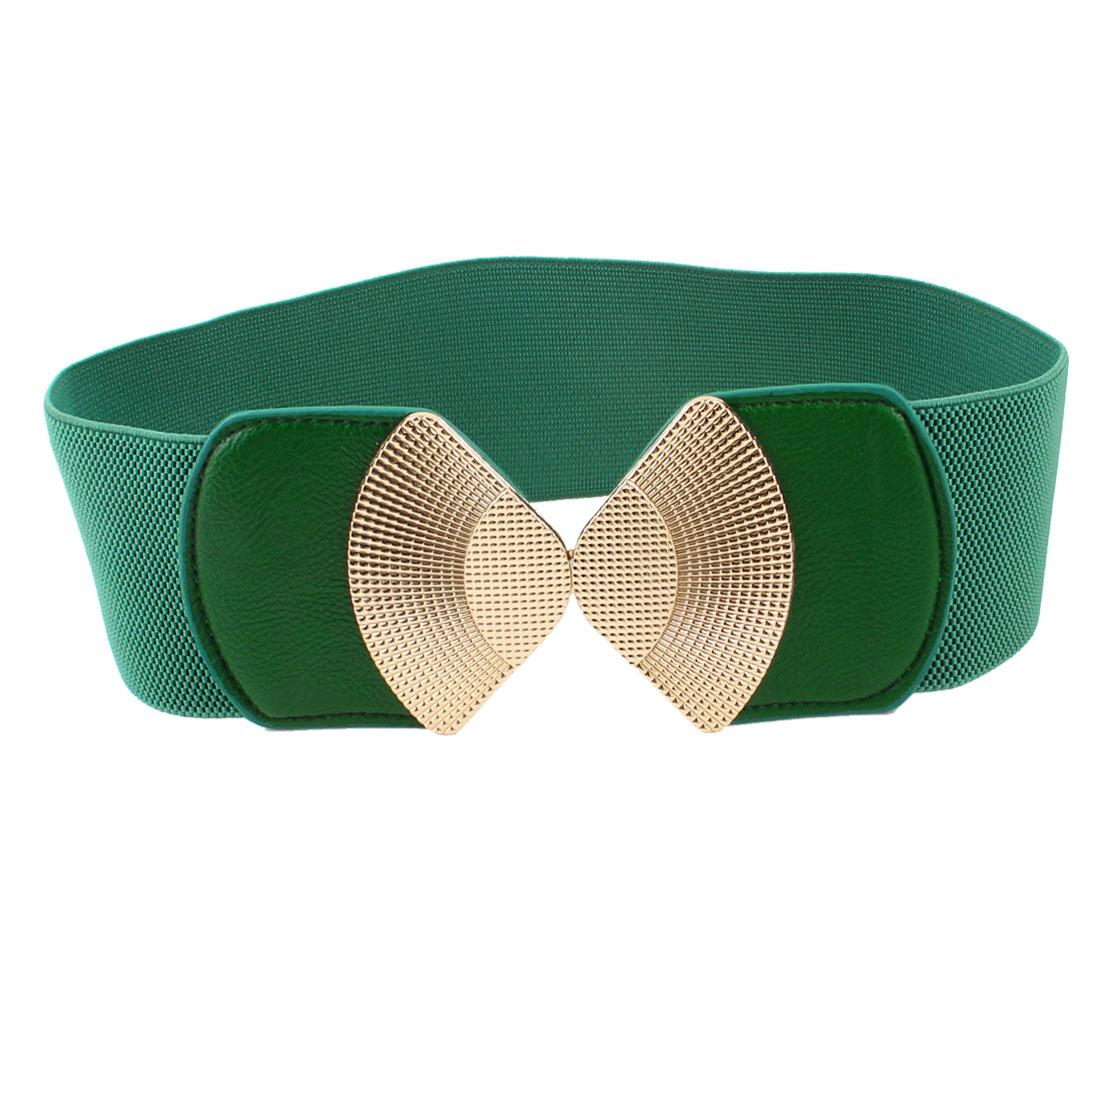 Lady Green Metal Interlock Buckle Elastic Waist Band Belt